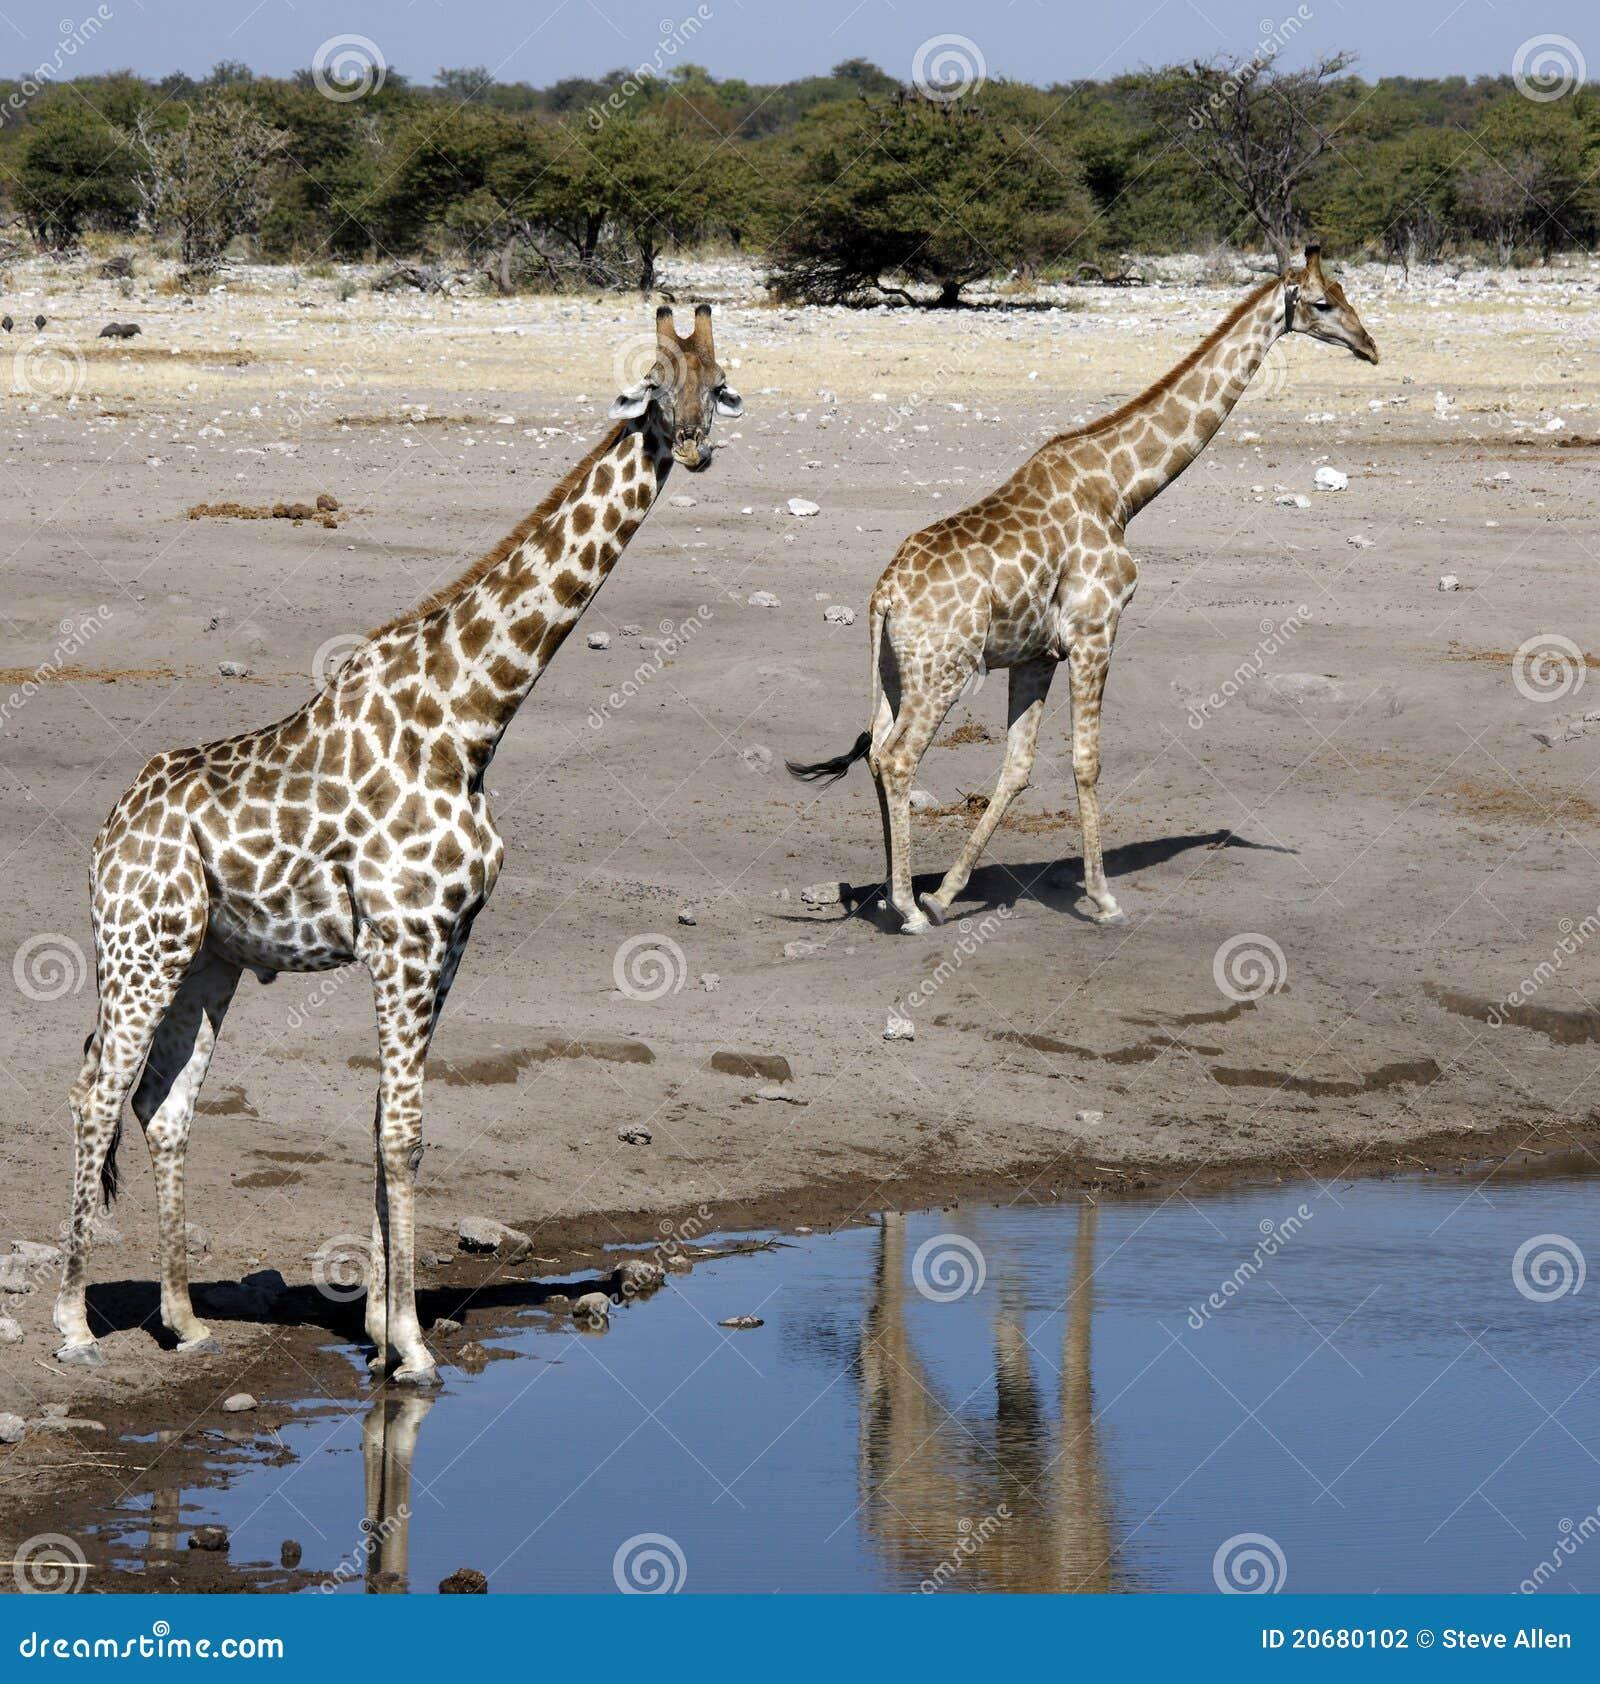 Giraffe - Etosha National Park - Namibia